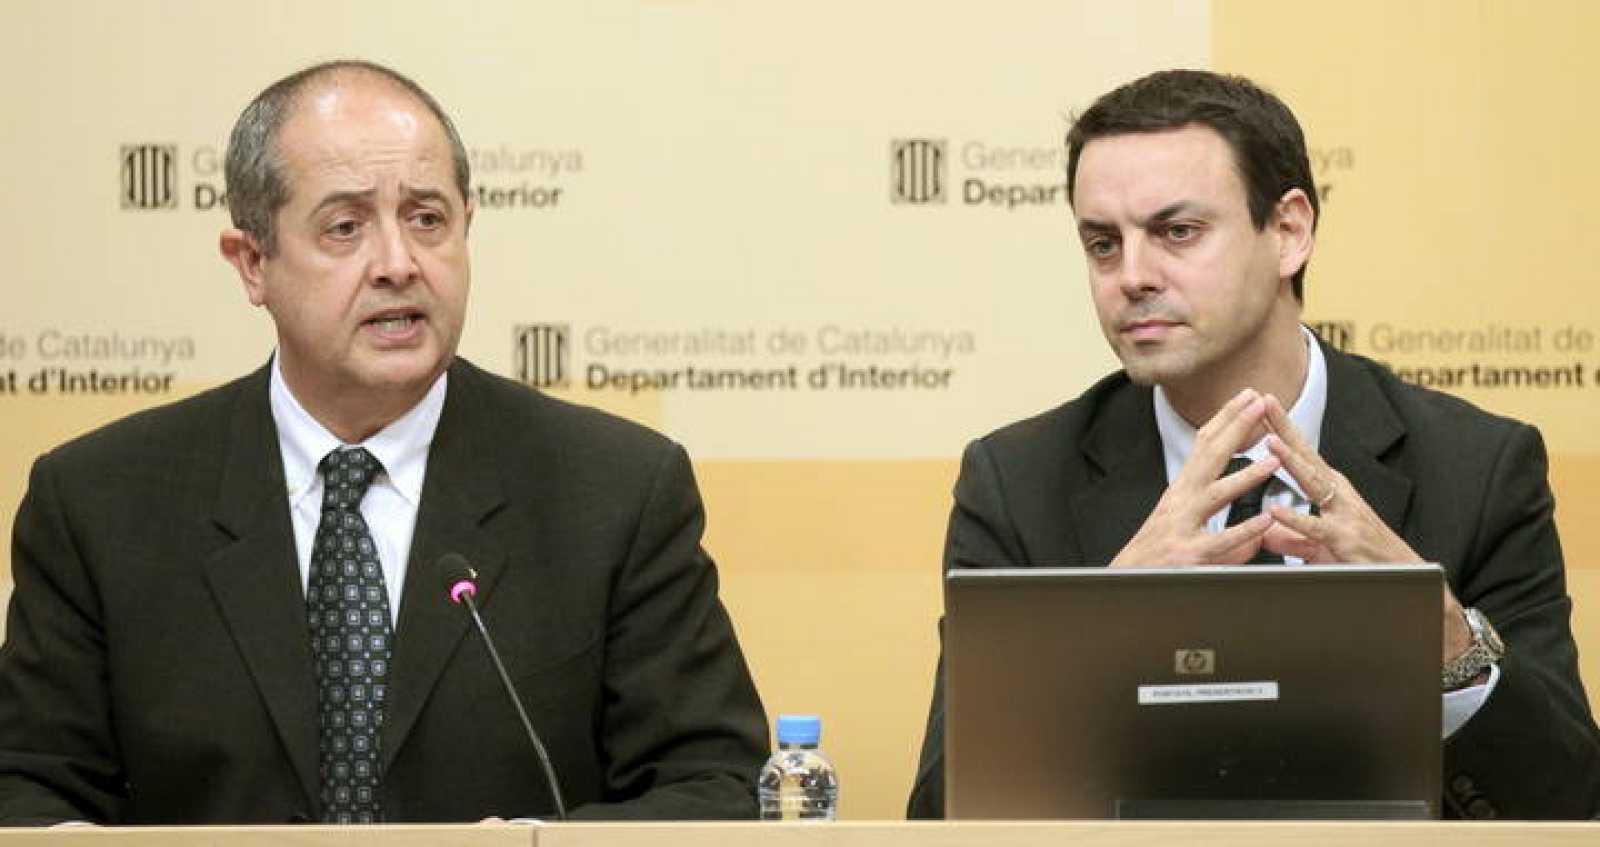 El conseller de Interior, Felip Puig, acompañado del director general de los Mossos d'Esquadra, Manel Prat.